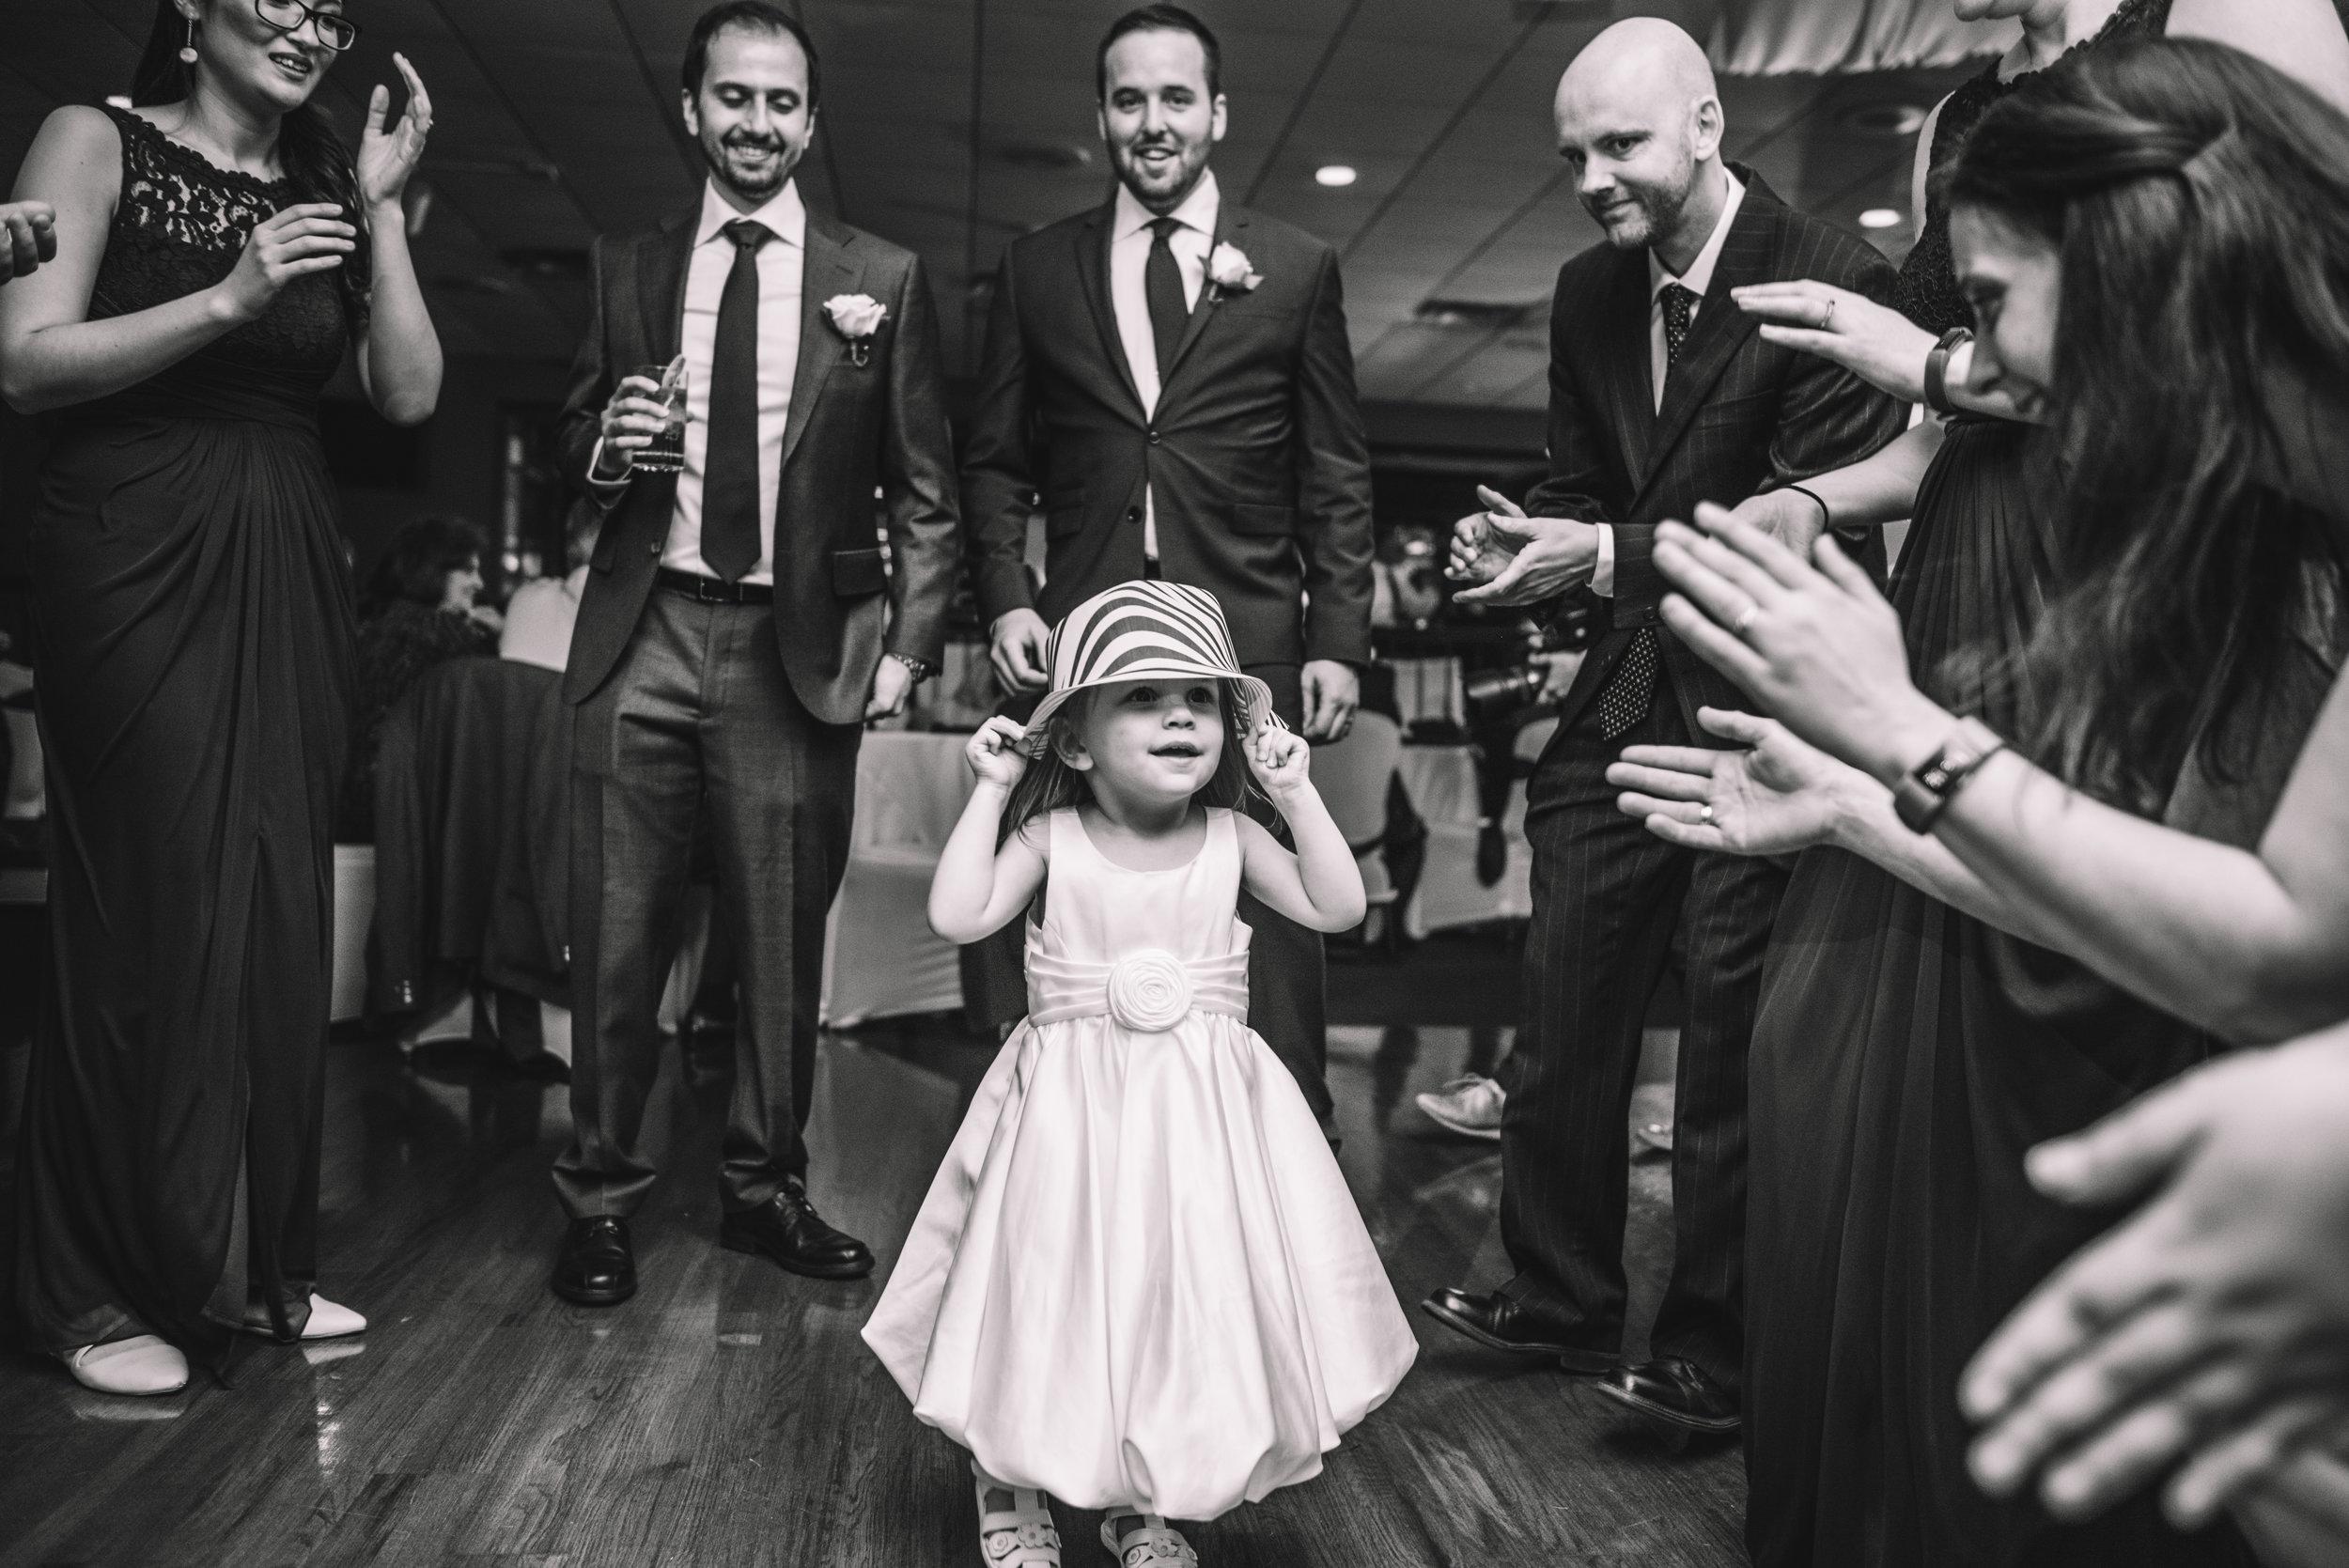 WeddingPhotos | NJPhotographer | Highlights-6.jpg